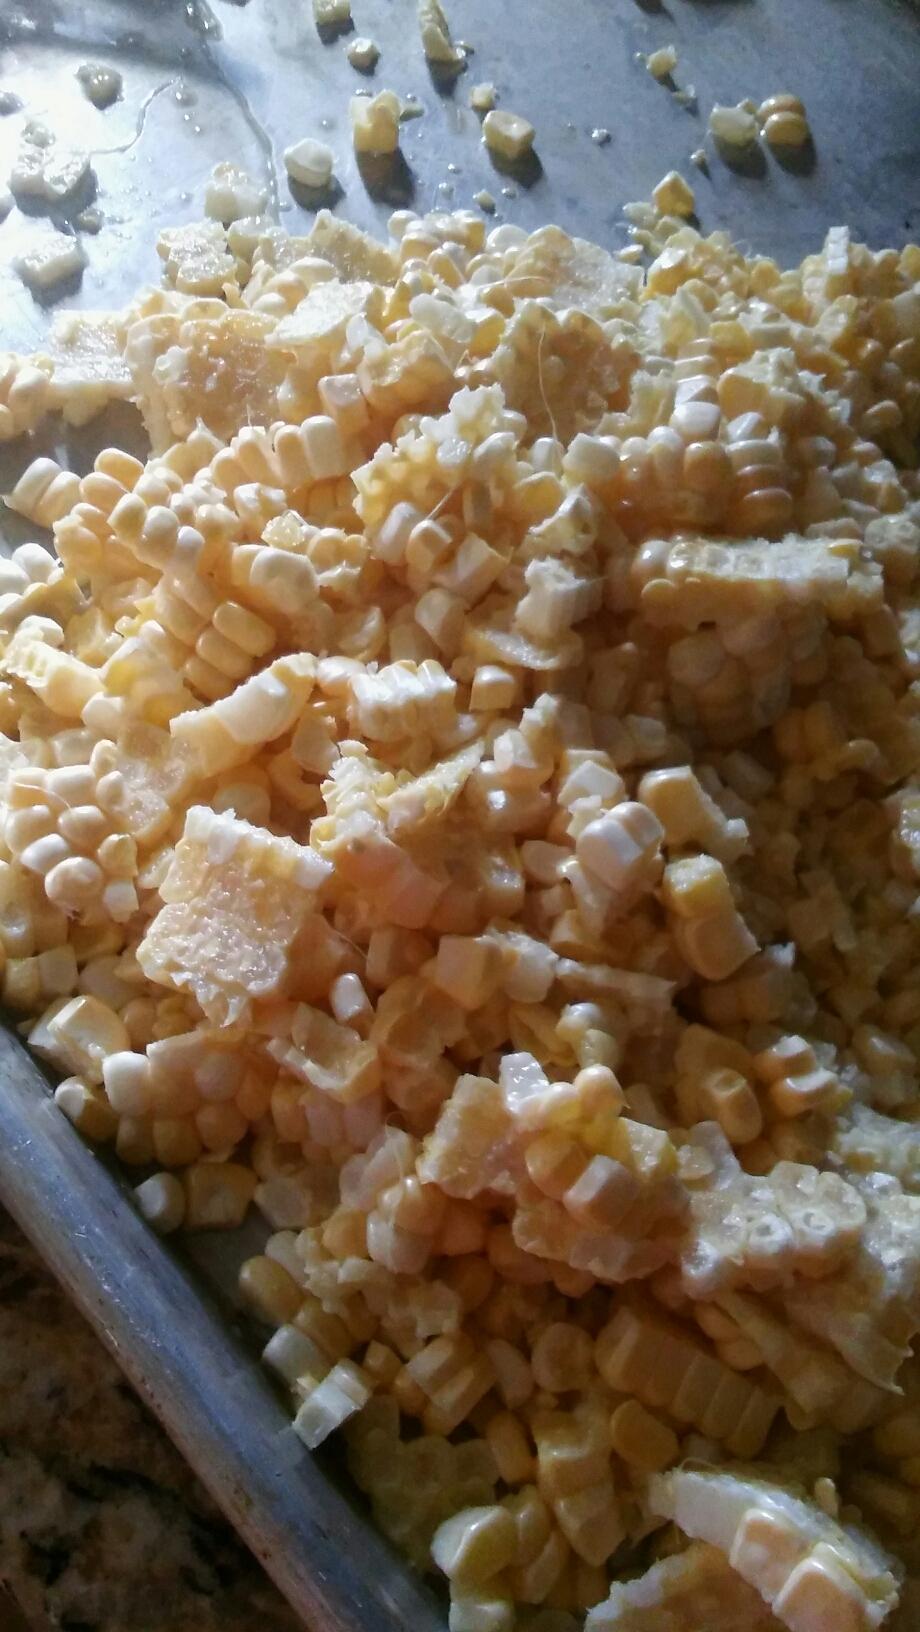 raw corn waiting to be frozen